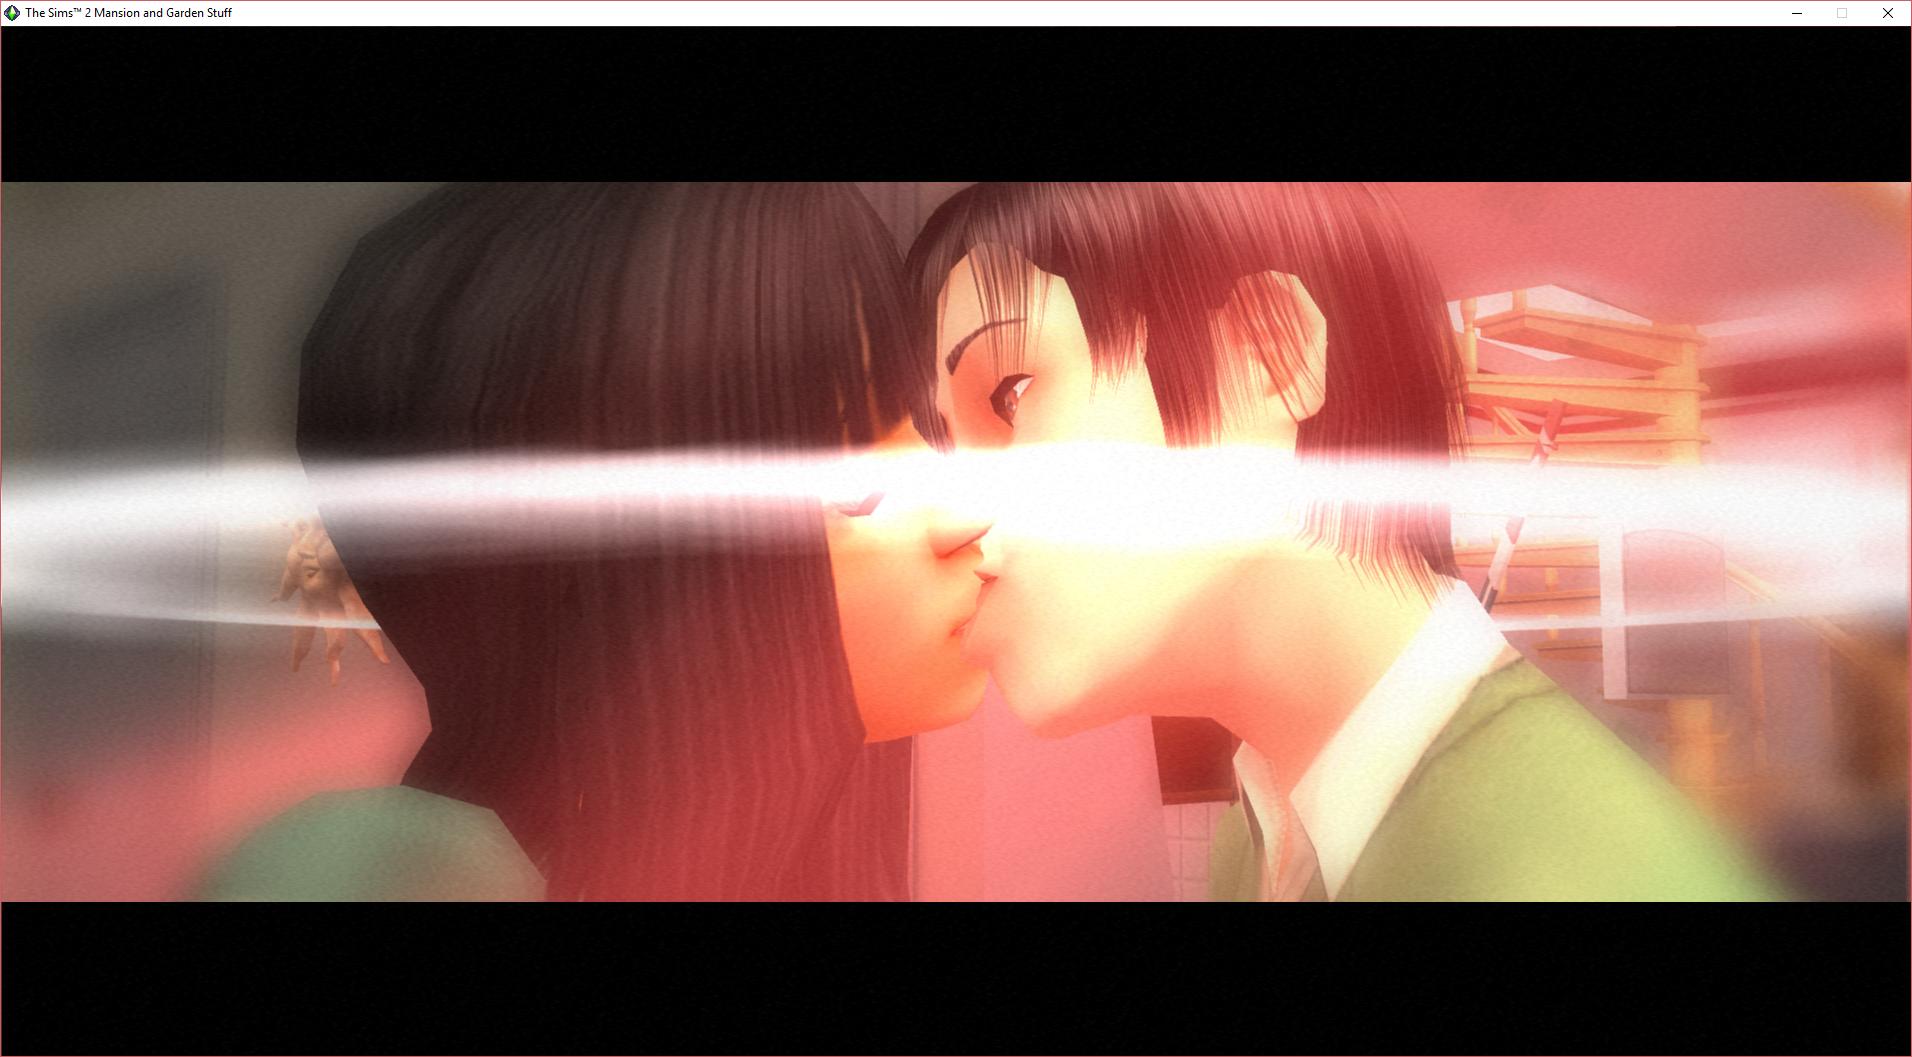 Jian_First_kiss.png